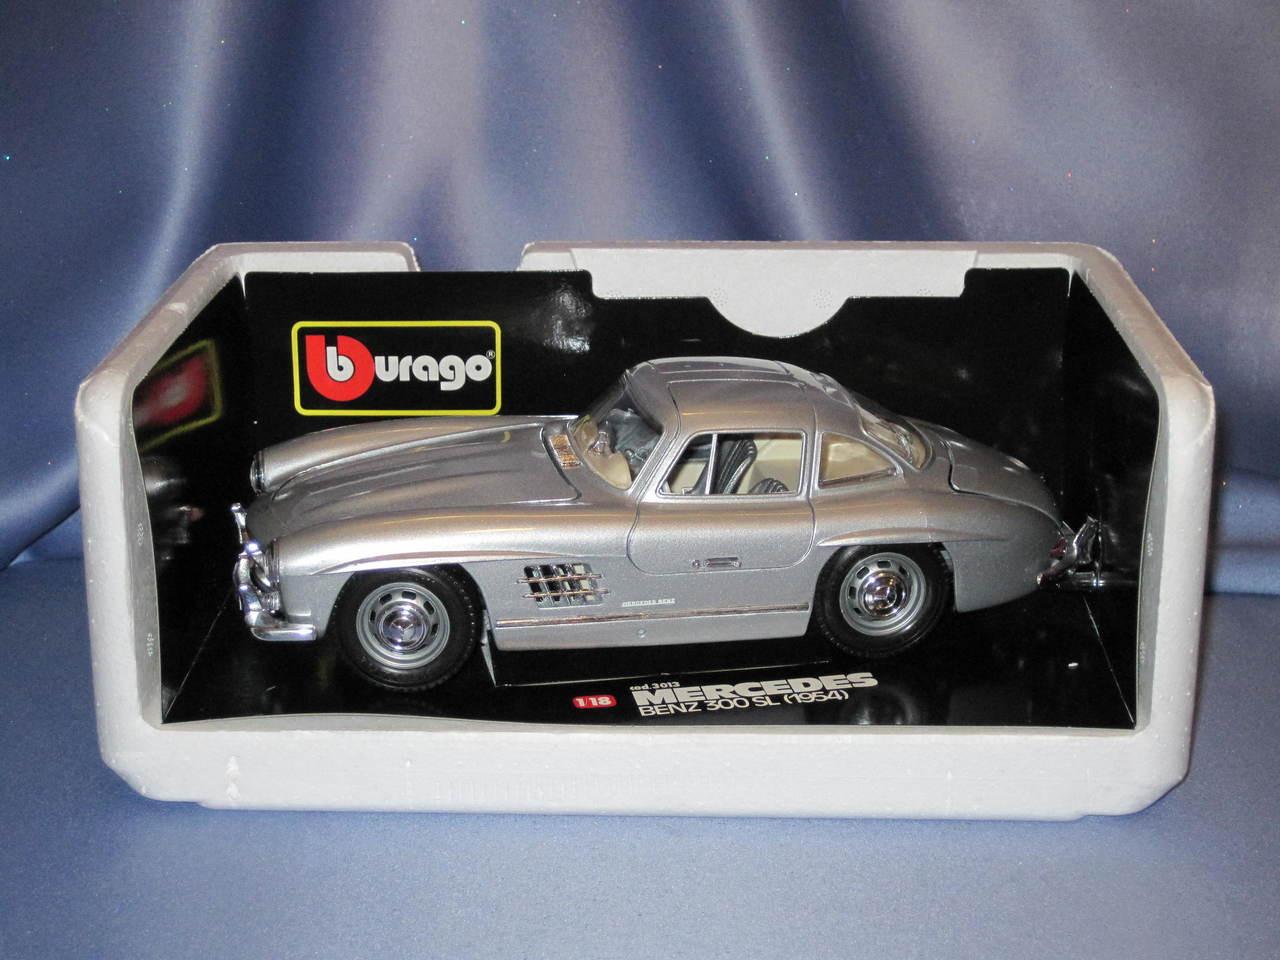 1954 Mercedes Benz 300SL 1:18 by Bburago.